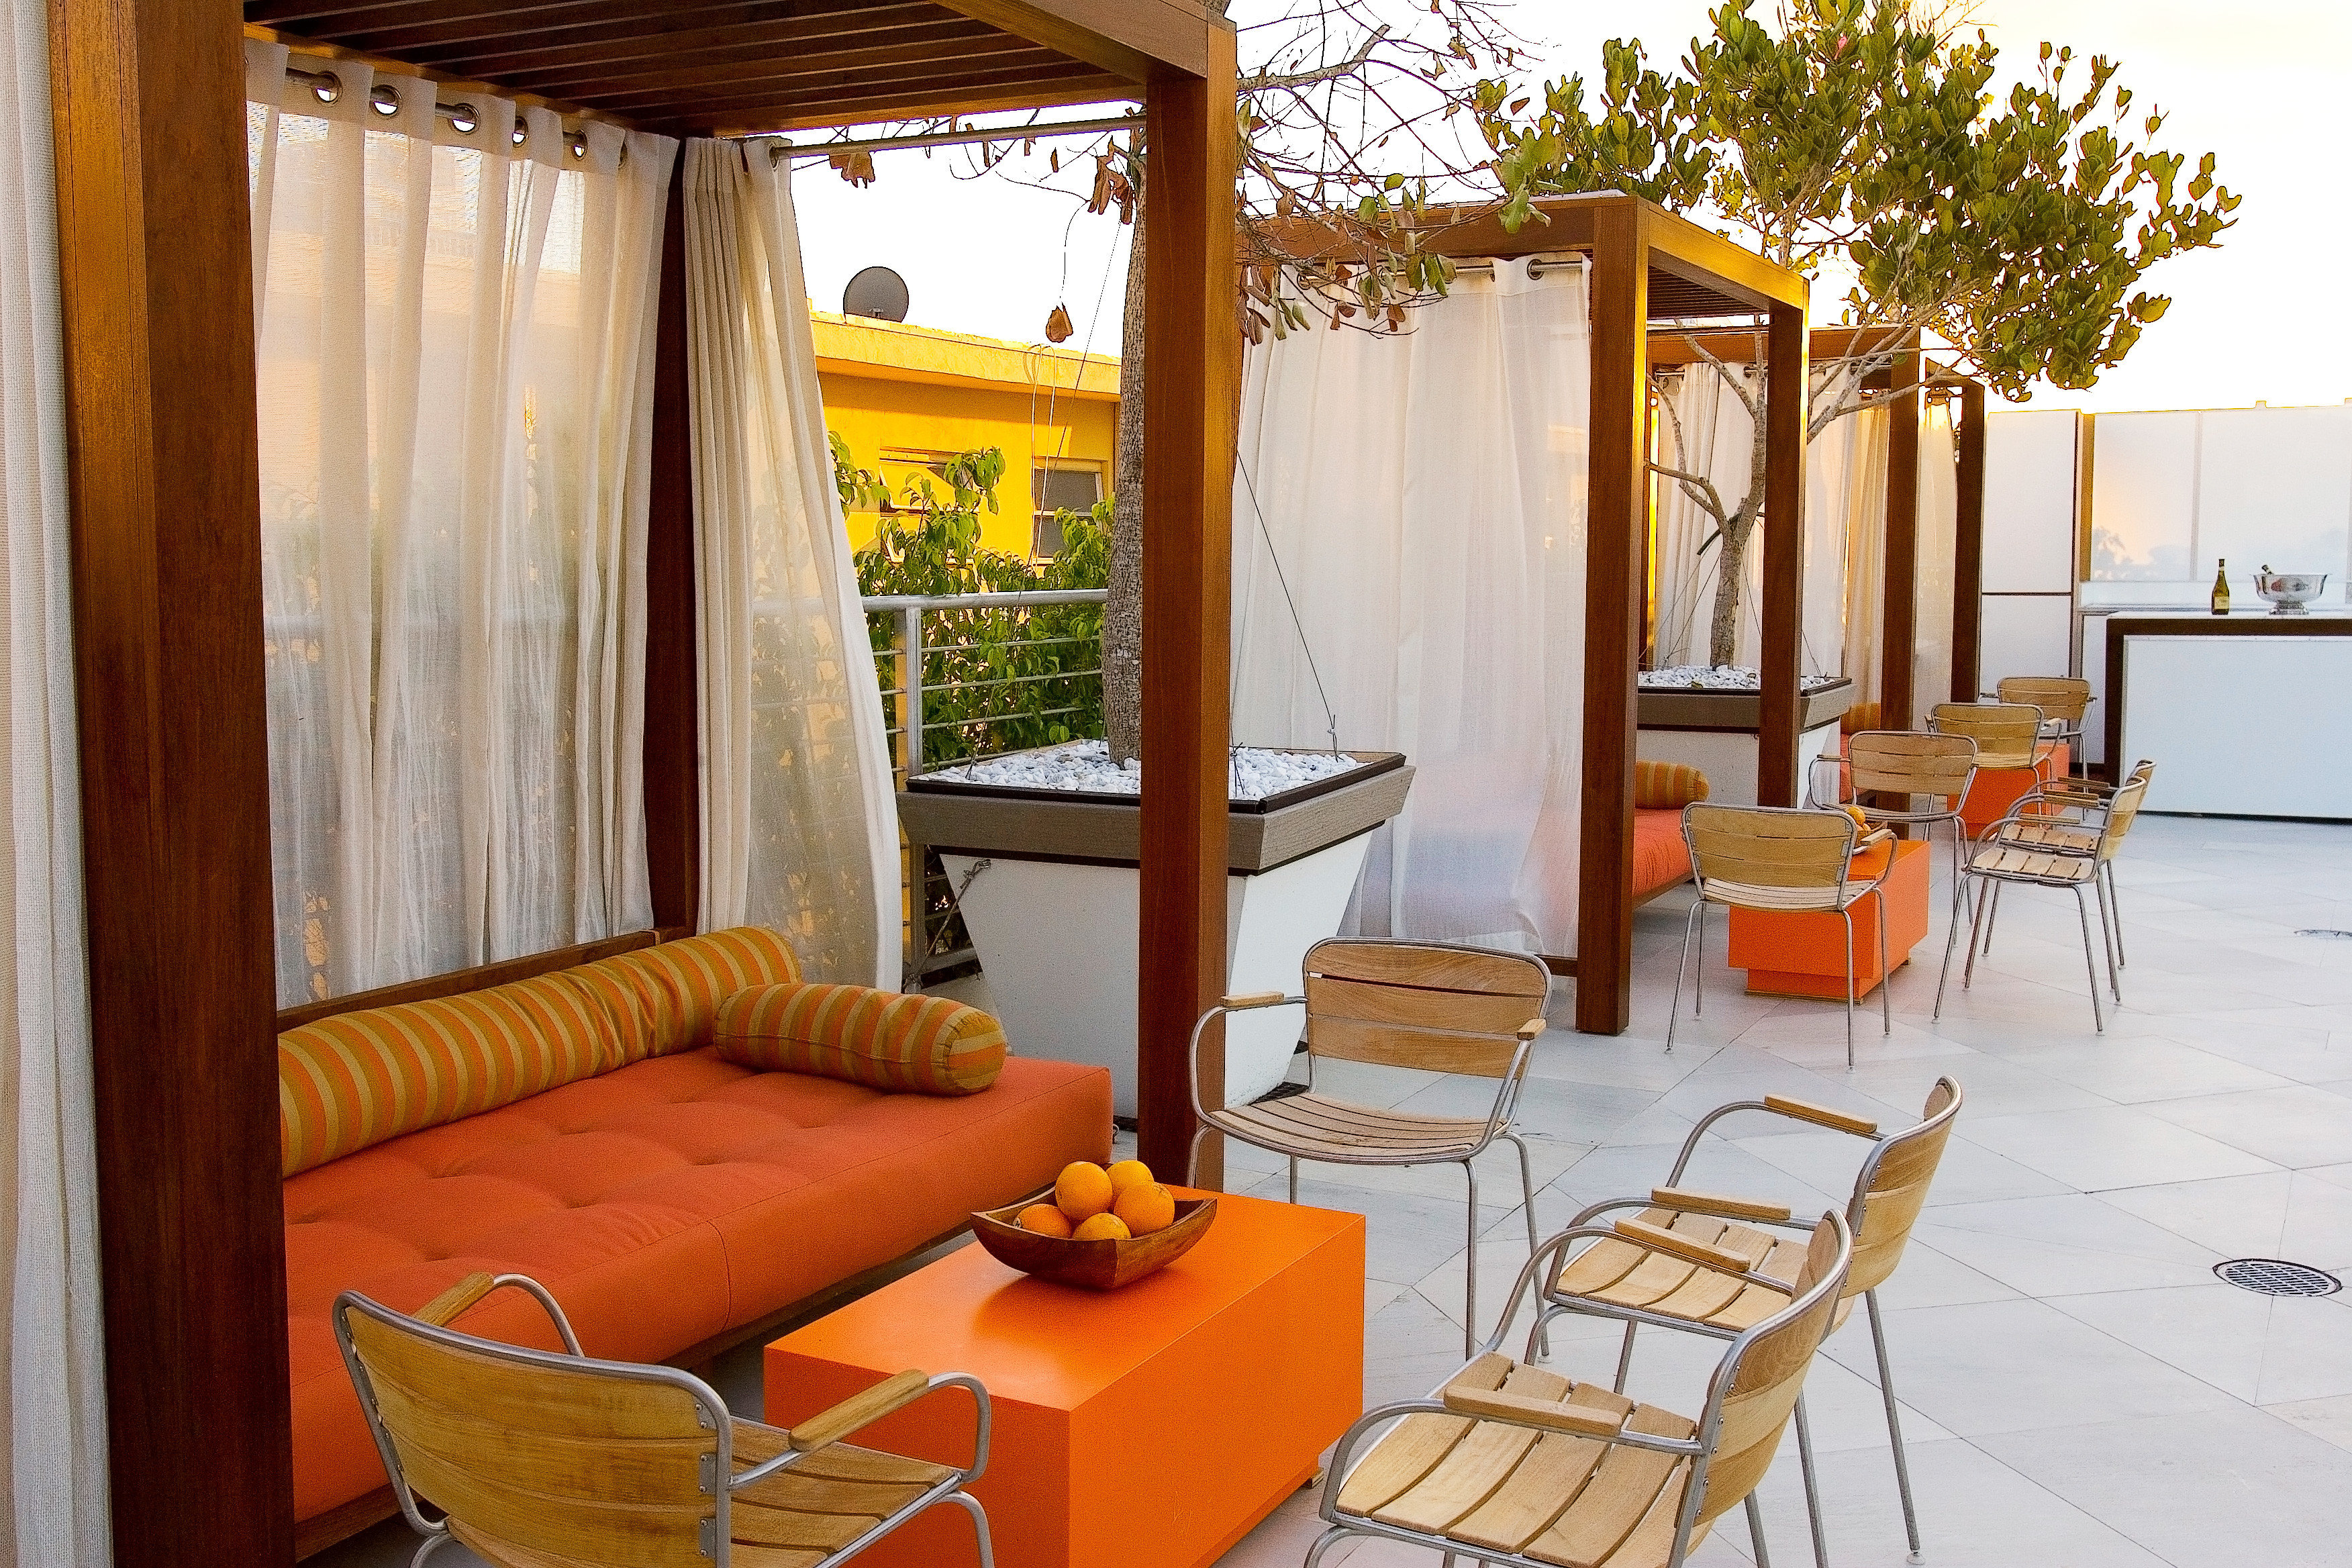 Lounge Luxury Modern chair property building Villa cottage Resort home Suite living room condominium